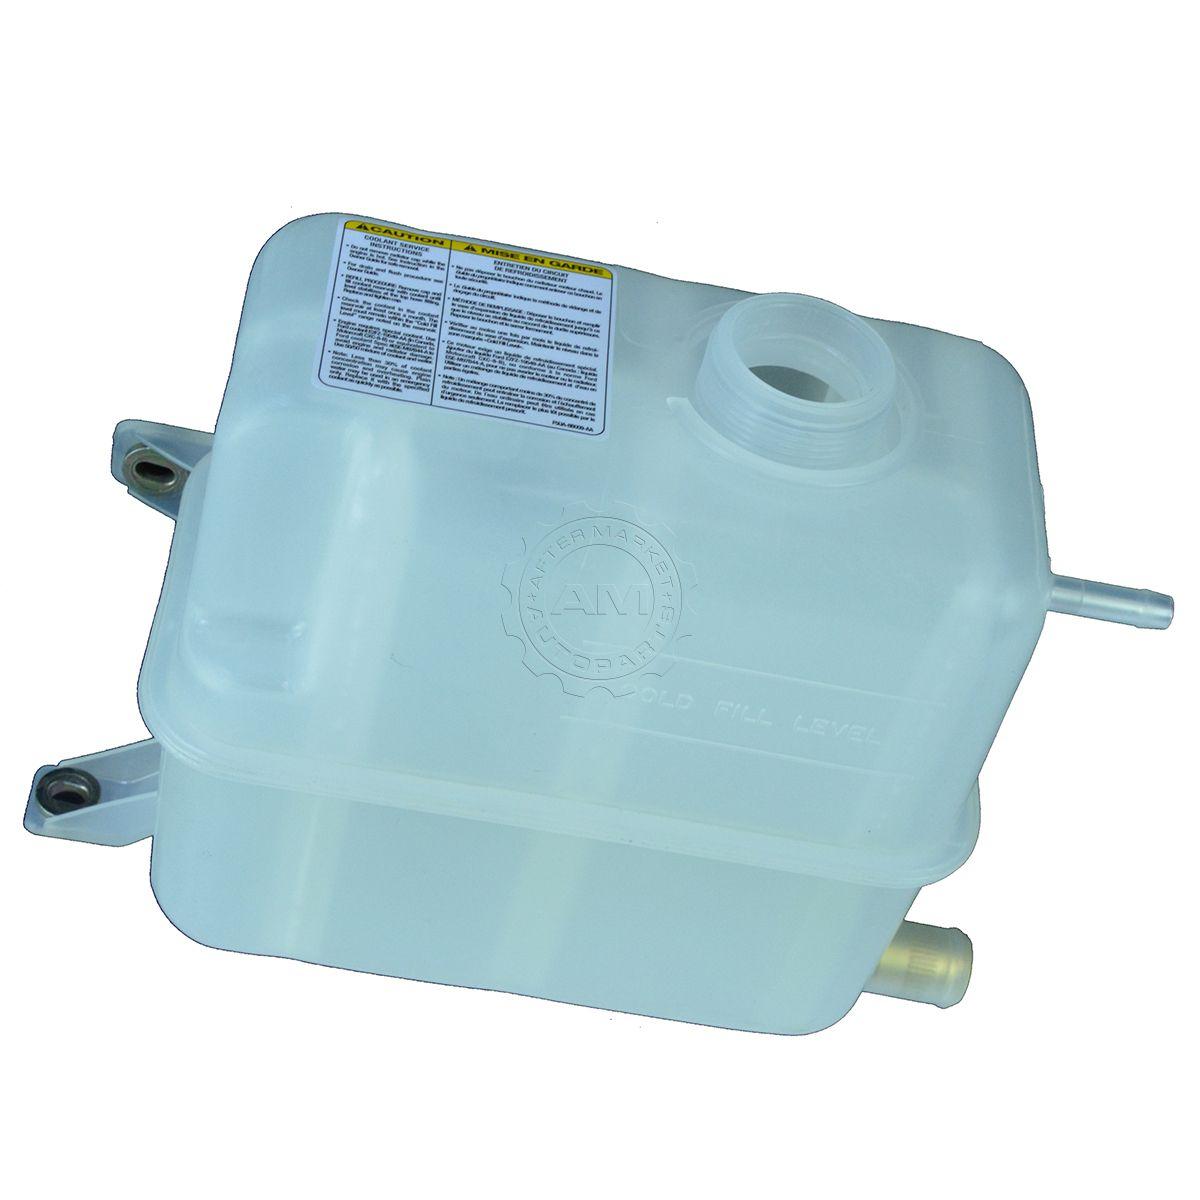 hight resolution of oem radiator coolant overflow tank bottle for 94 97 ford f250 f350 powerstroke